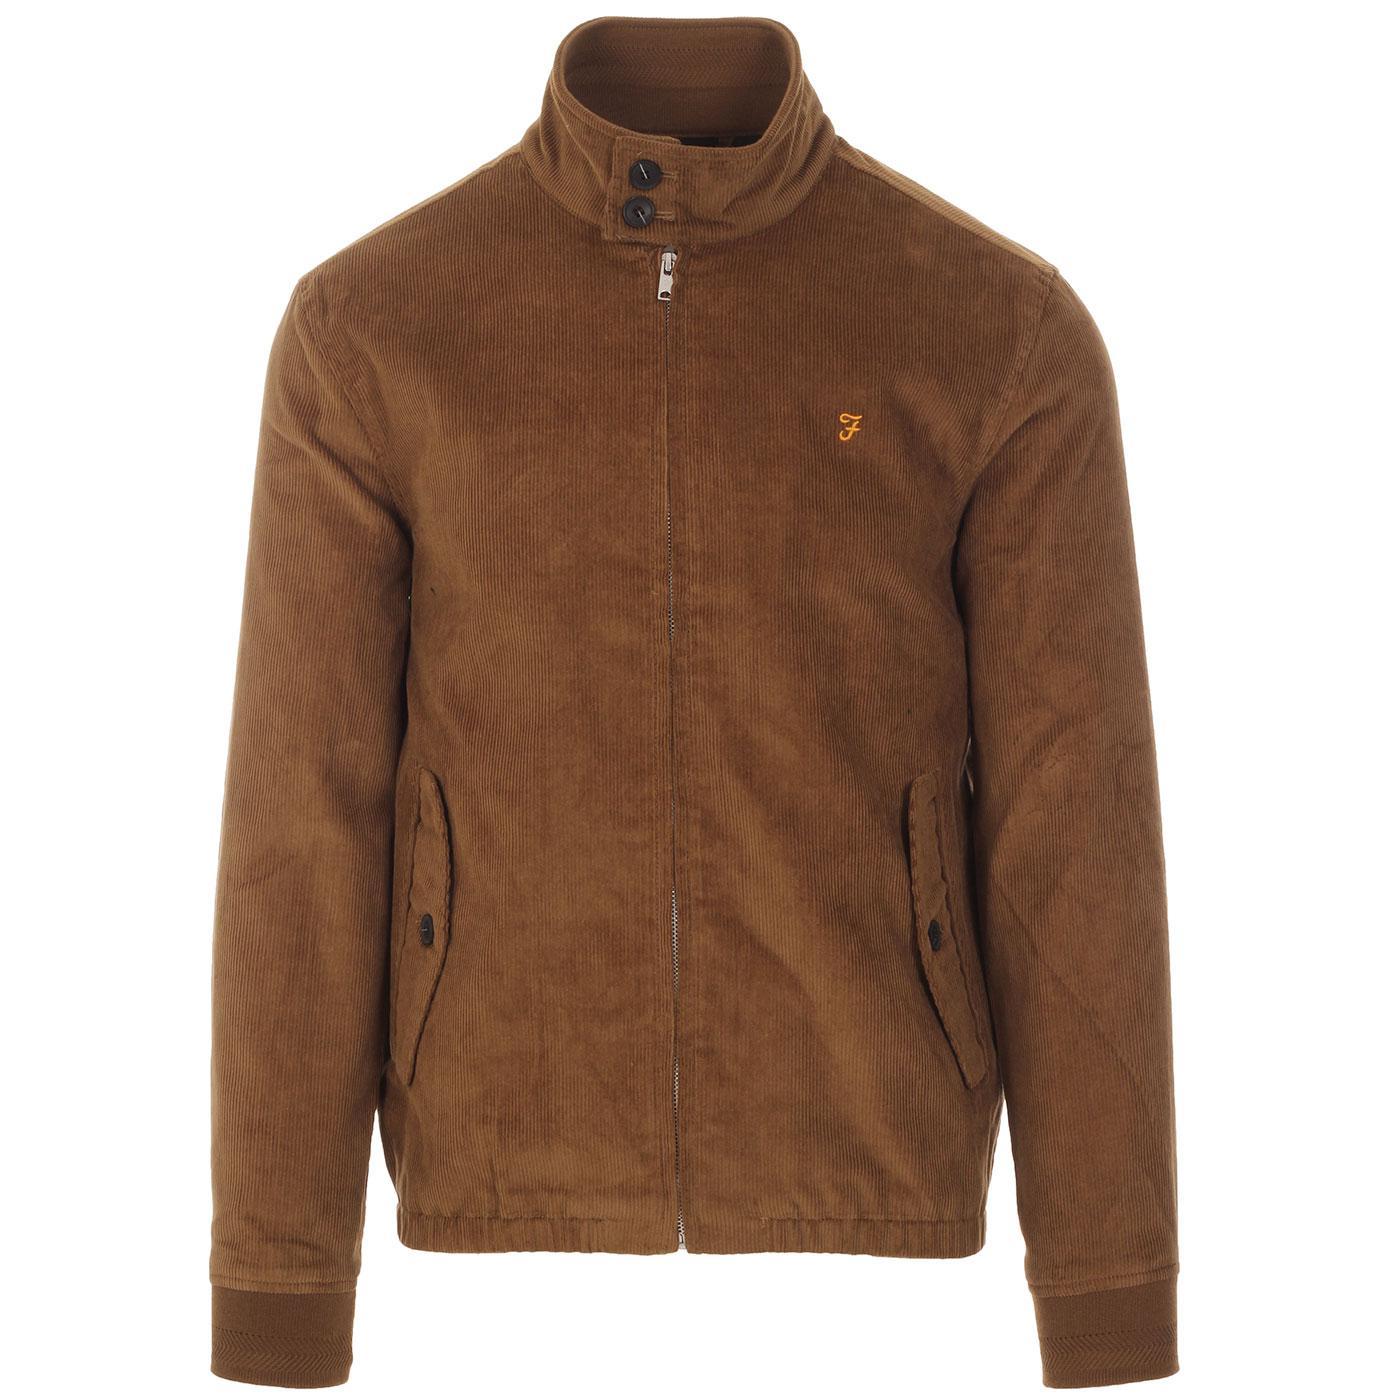 Bowie FARAH 100 Retro Mod Cord Harrington Jacket